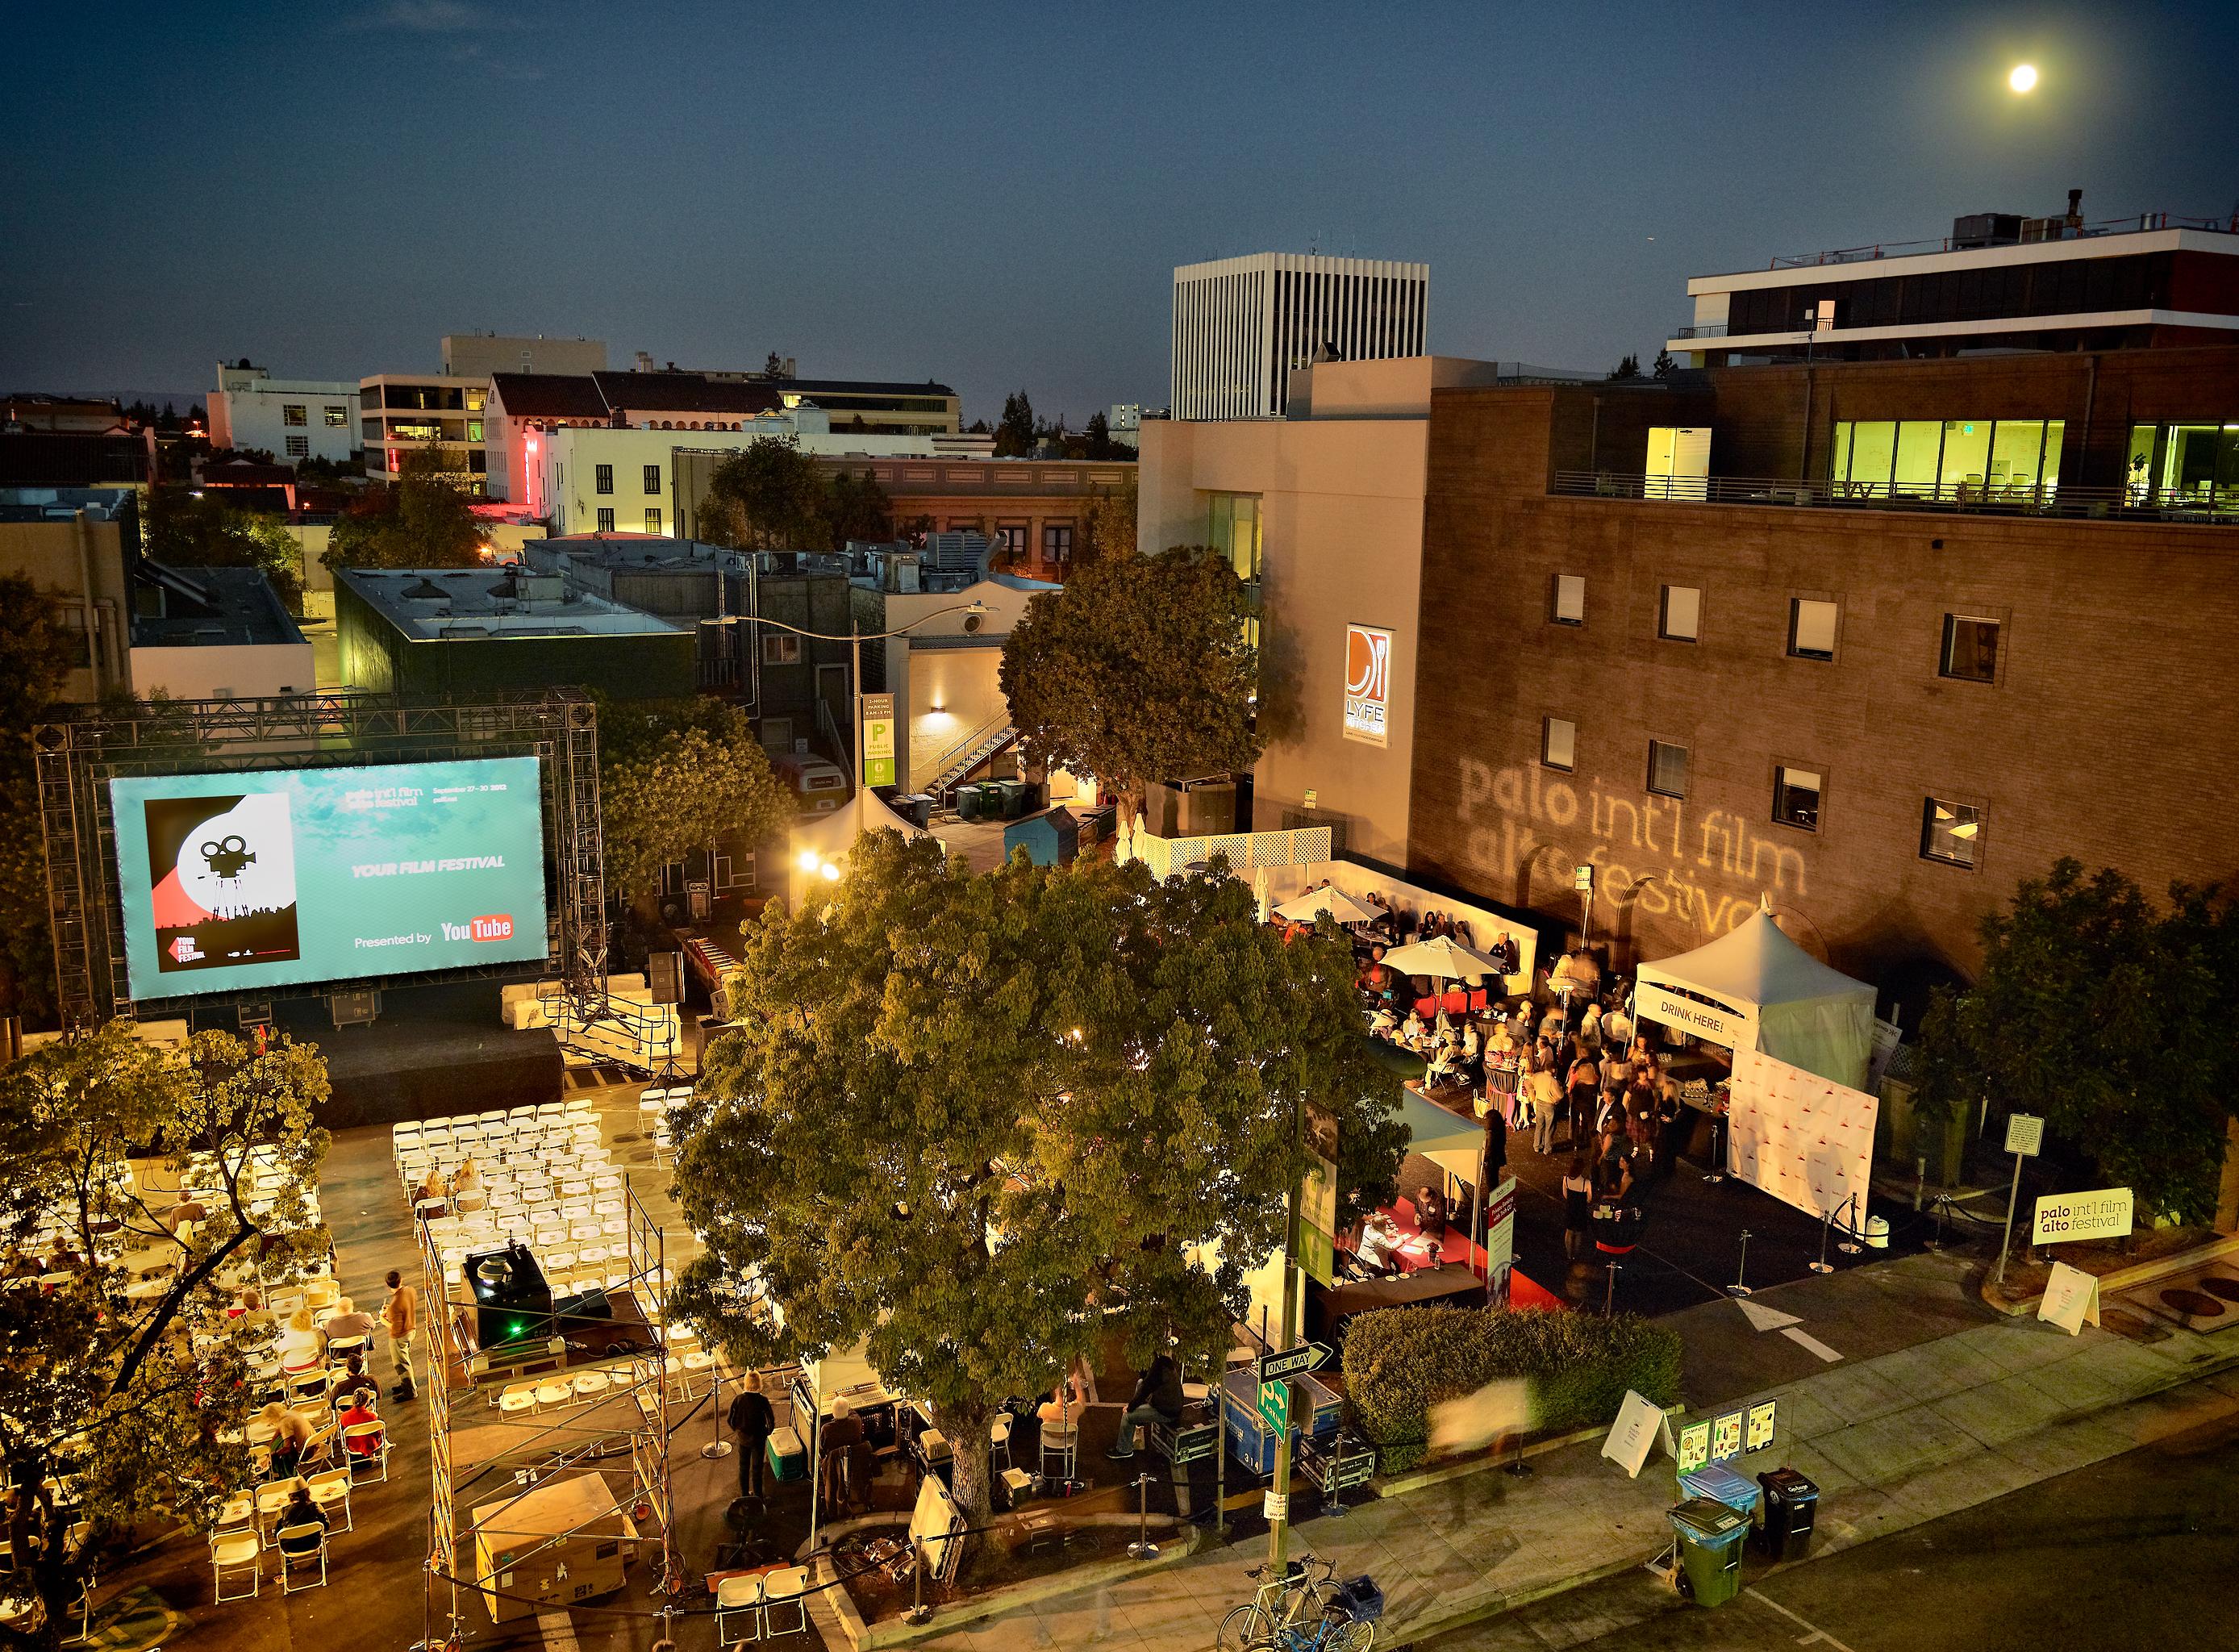 Palo Alto International Film Festival 2012 by Peter Adams.